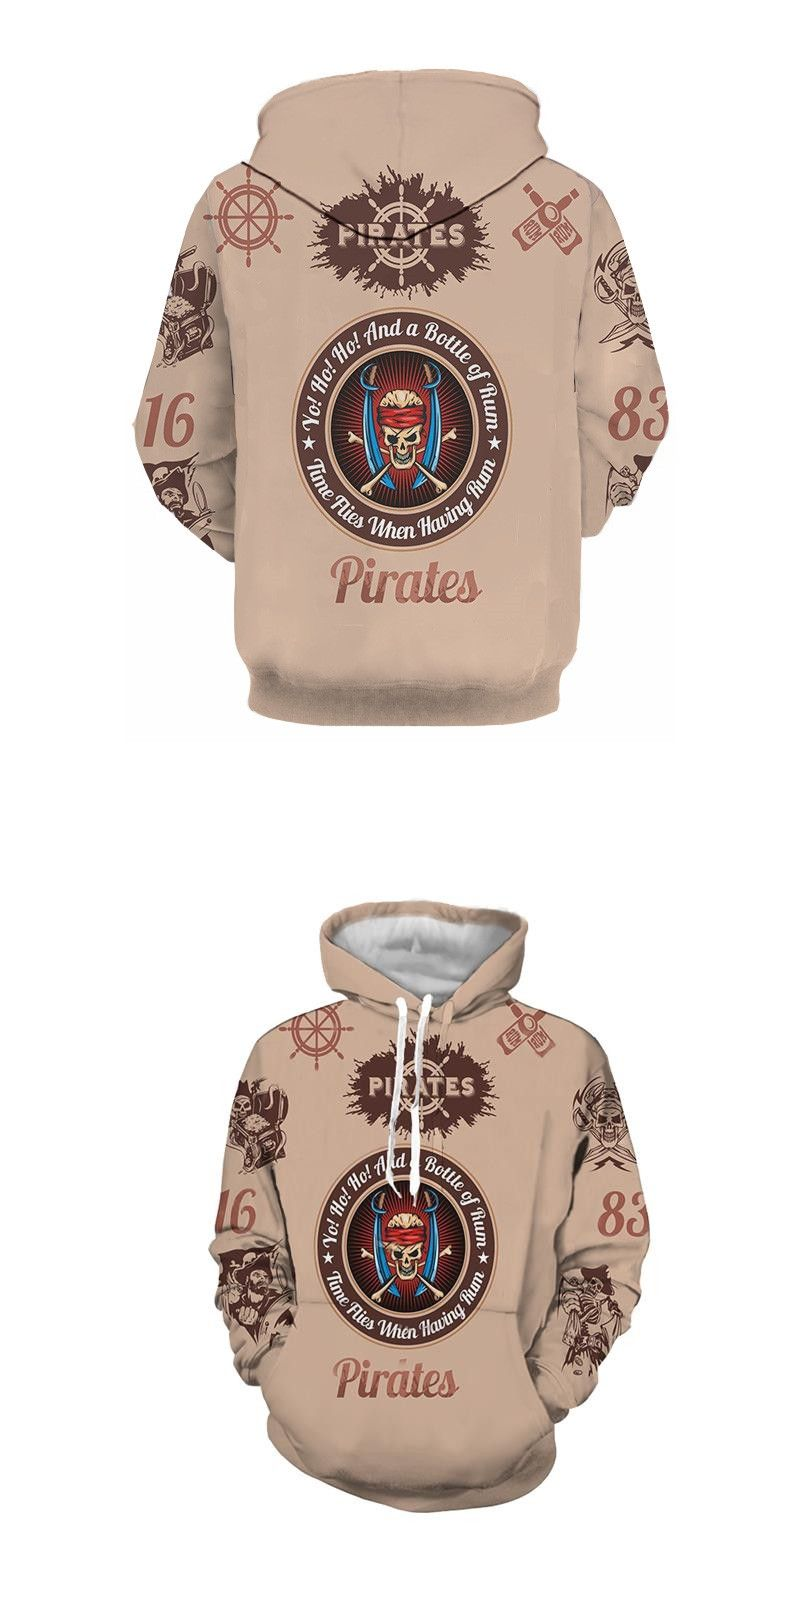 2d0debc070ad Movie Pirates Skull 3D Printed Hoodies Mens Women Unisex Fashion Casual  Cotton fleece hooded Sweatshirt Coats